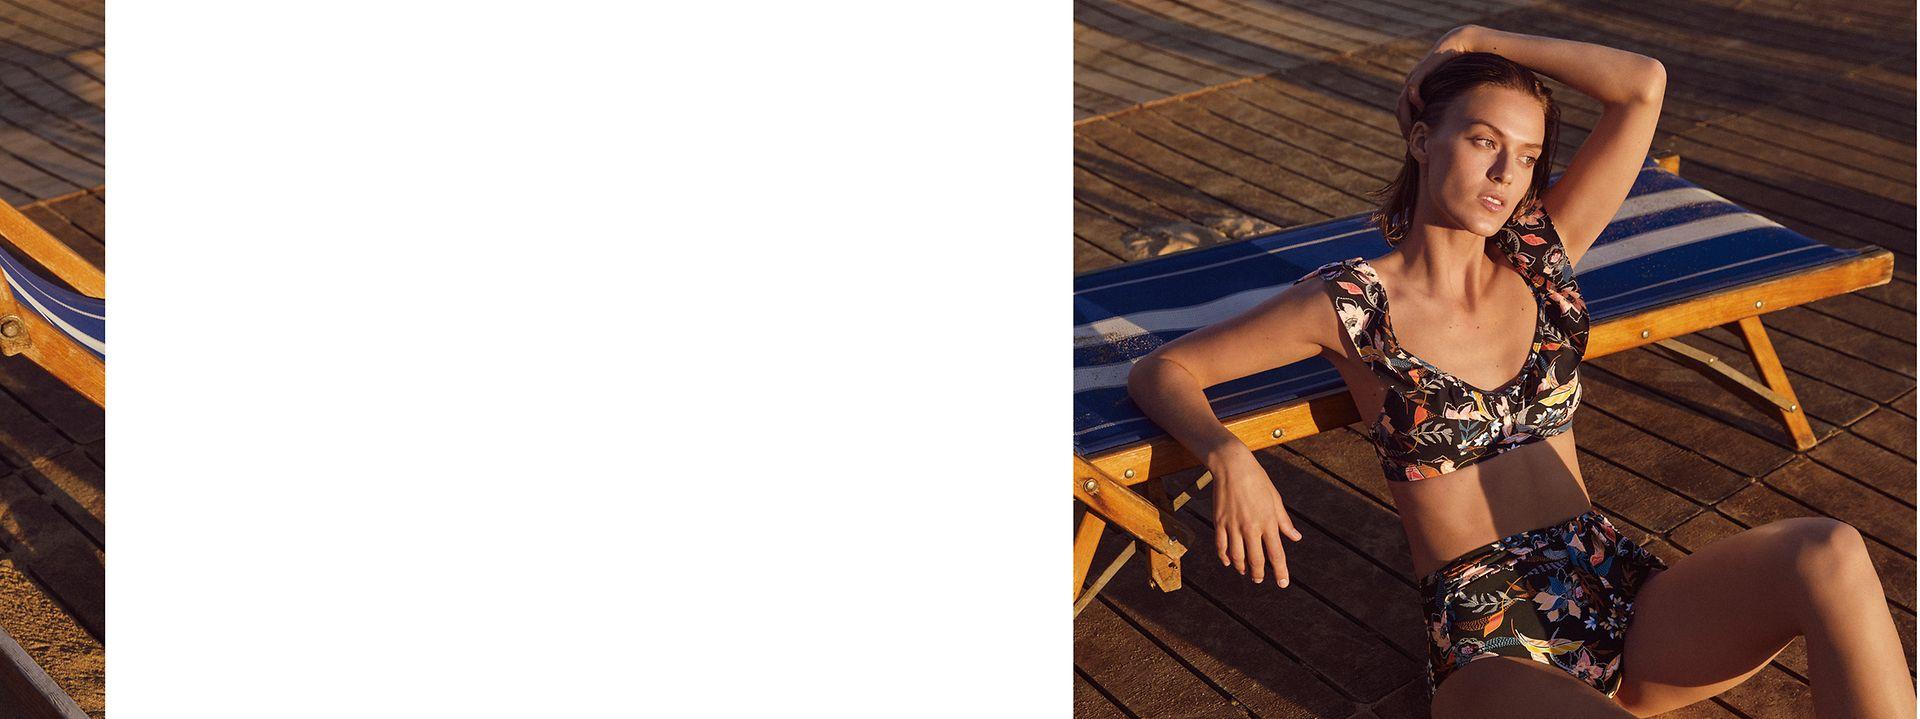 242021 - women - startpage - main banner - hot summer styles - IMG